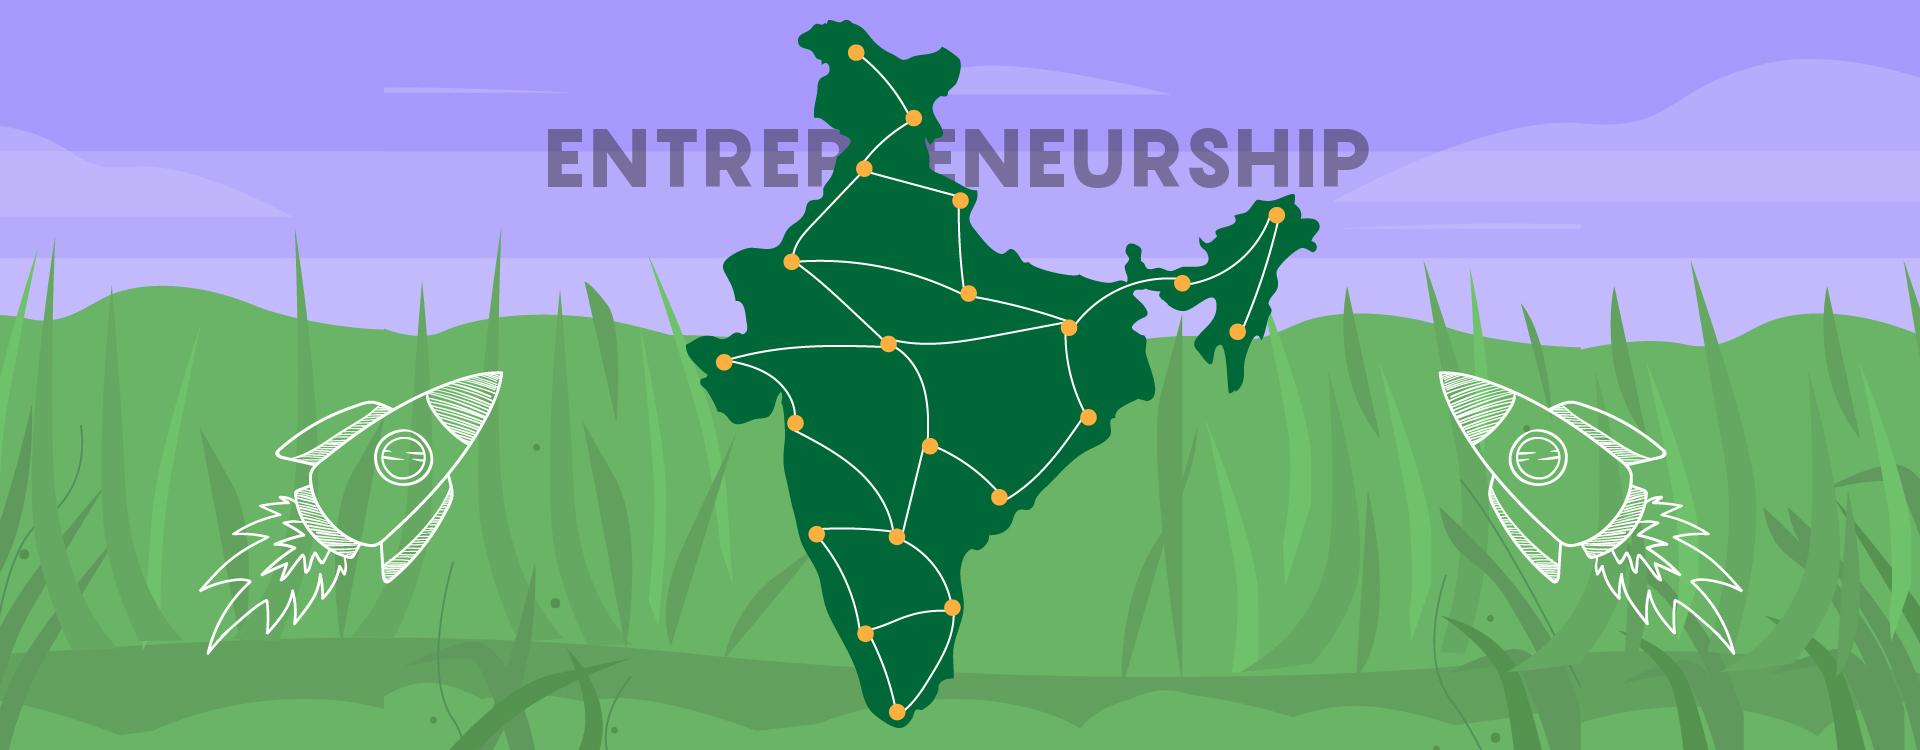 Entrepreneurship beyond Tier 1 cities